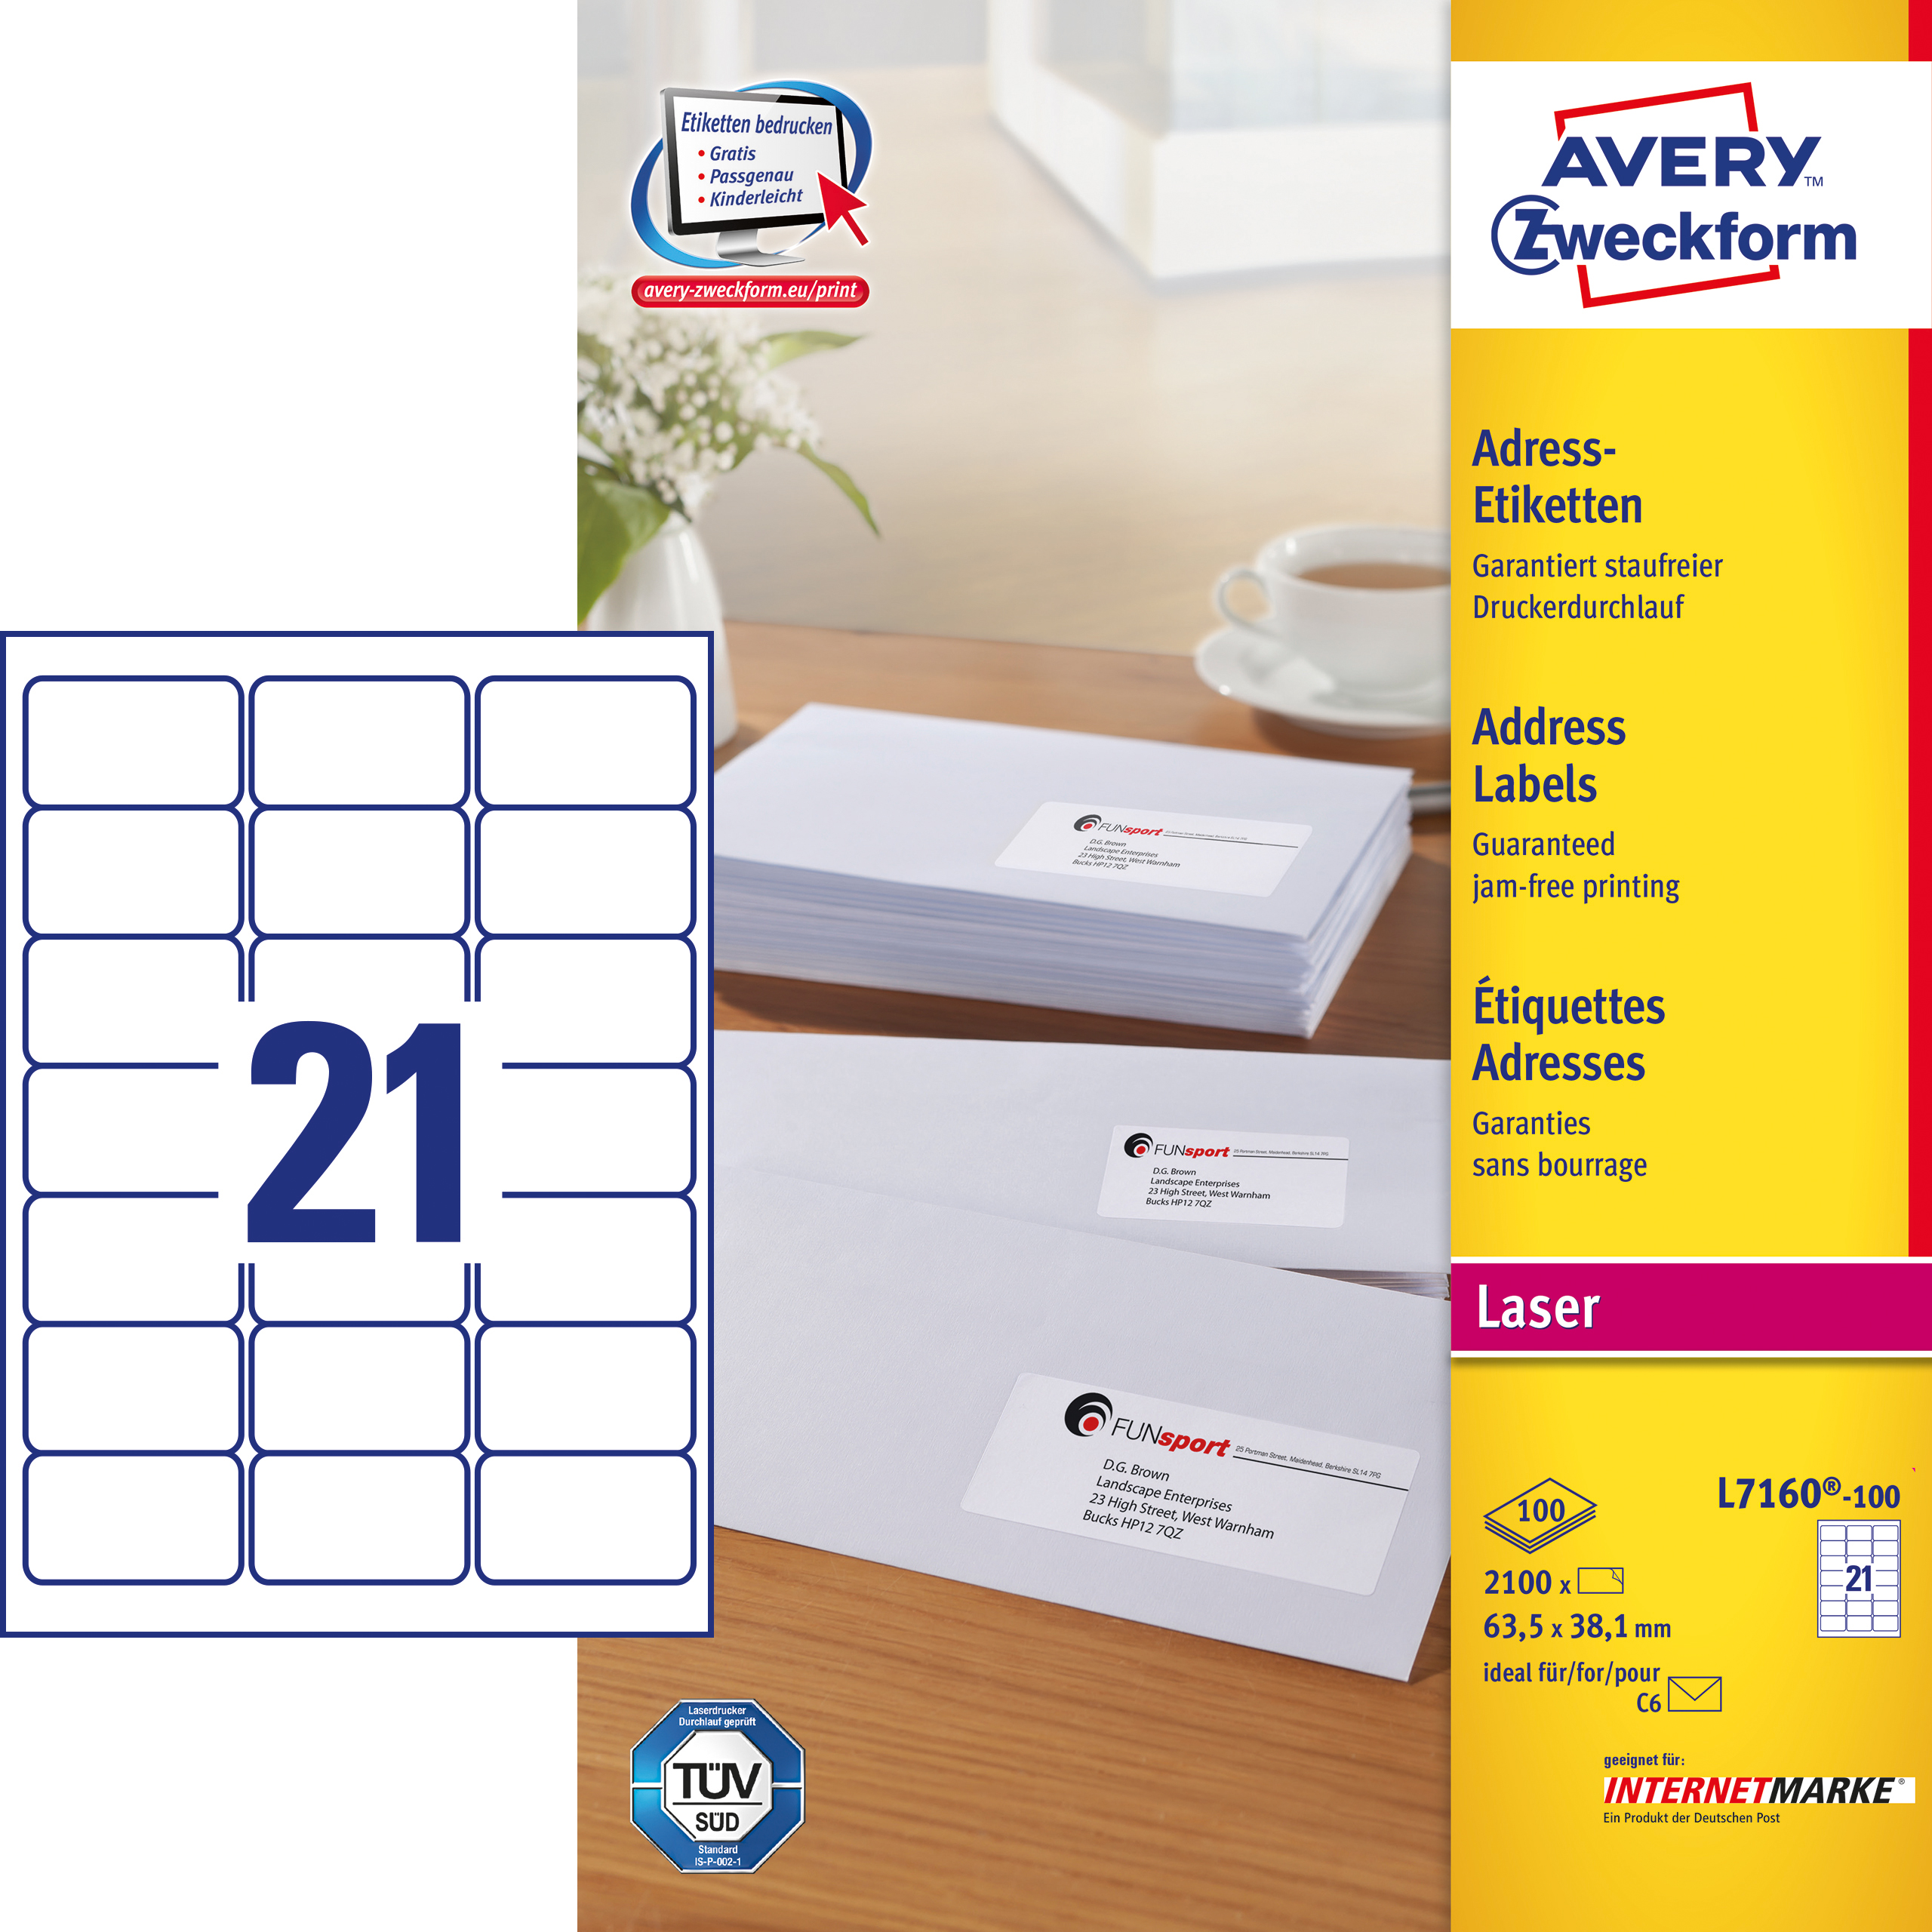 Image of Avery adresseetiket 63,5x38,1mm QP (2100)